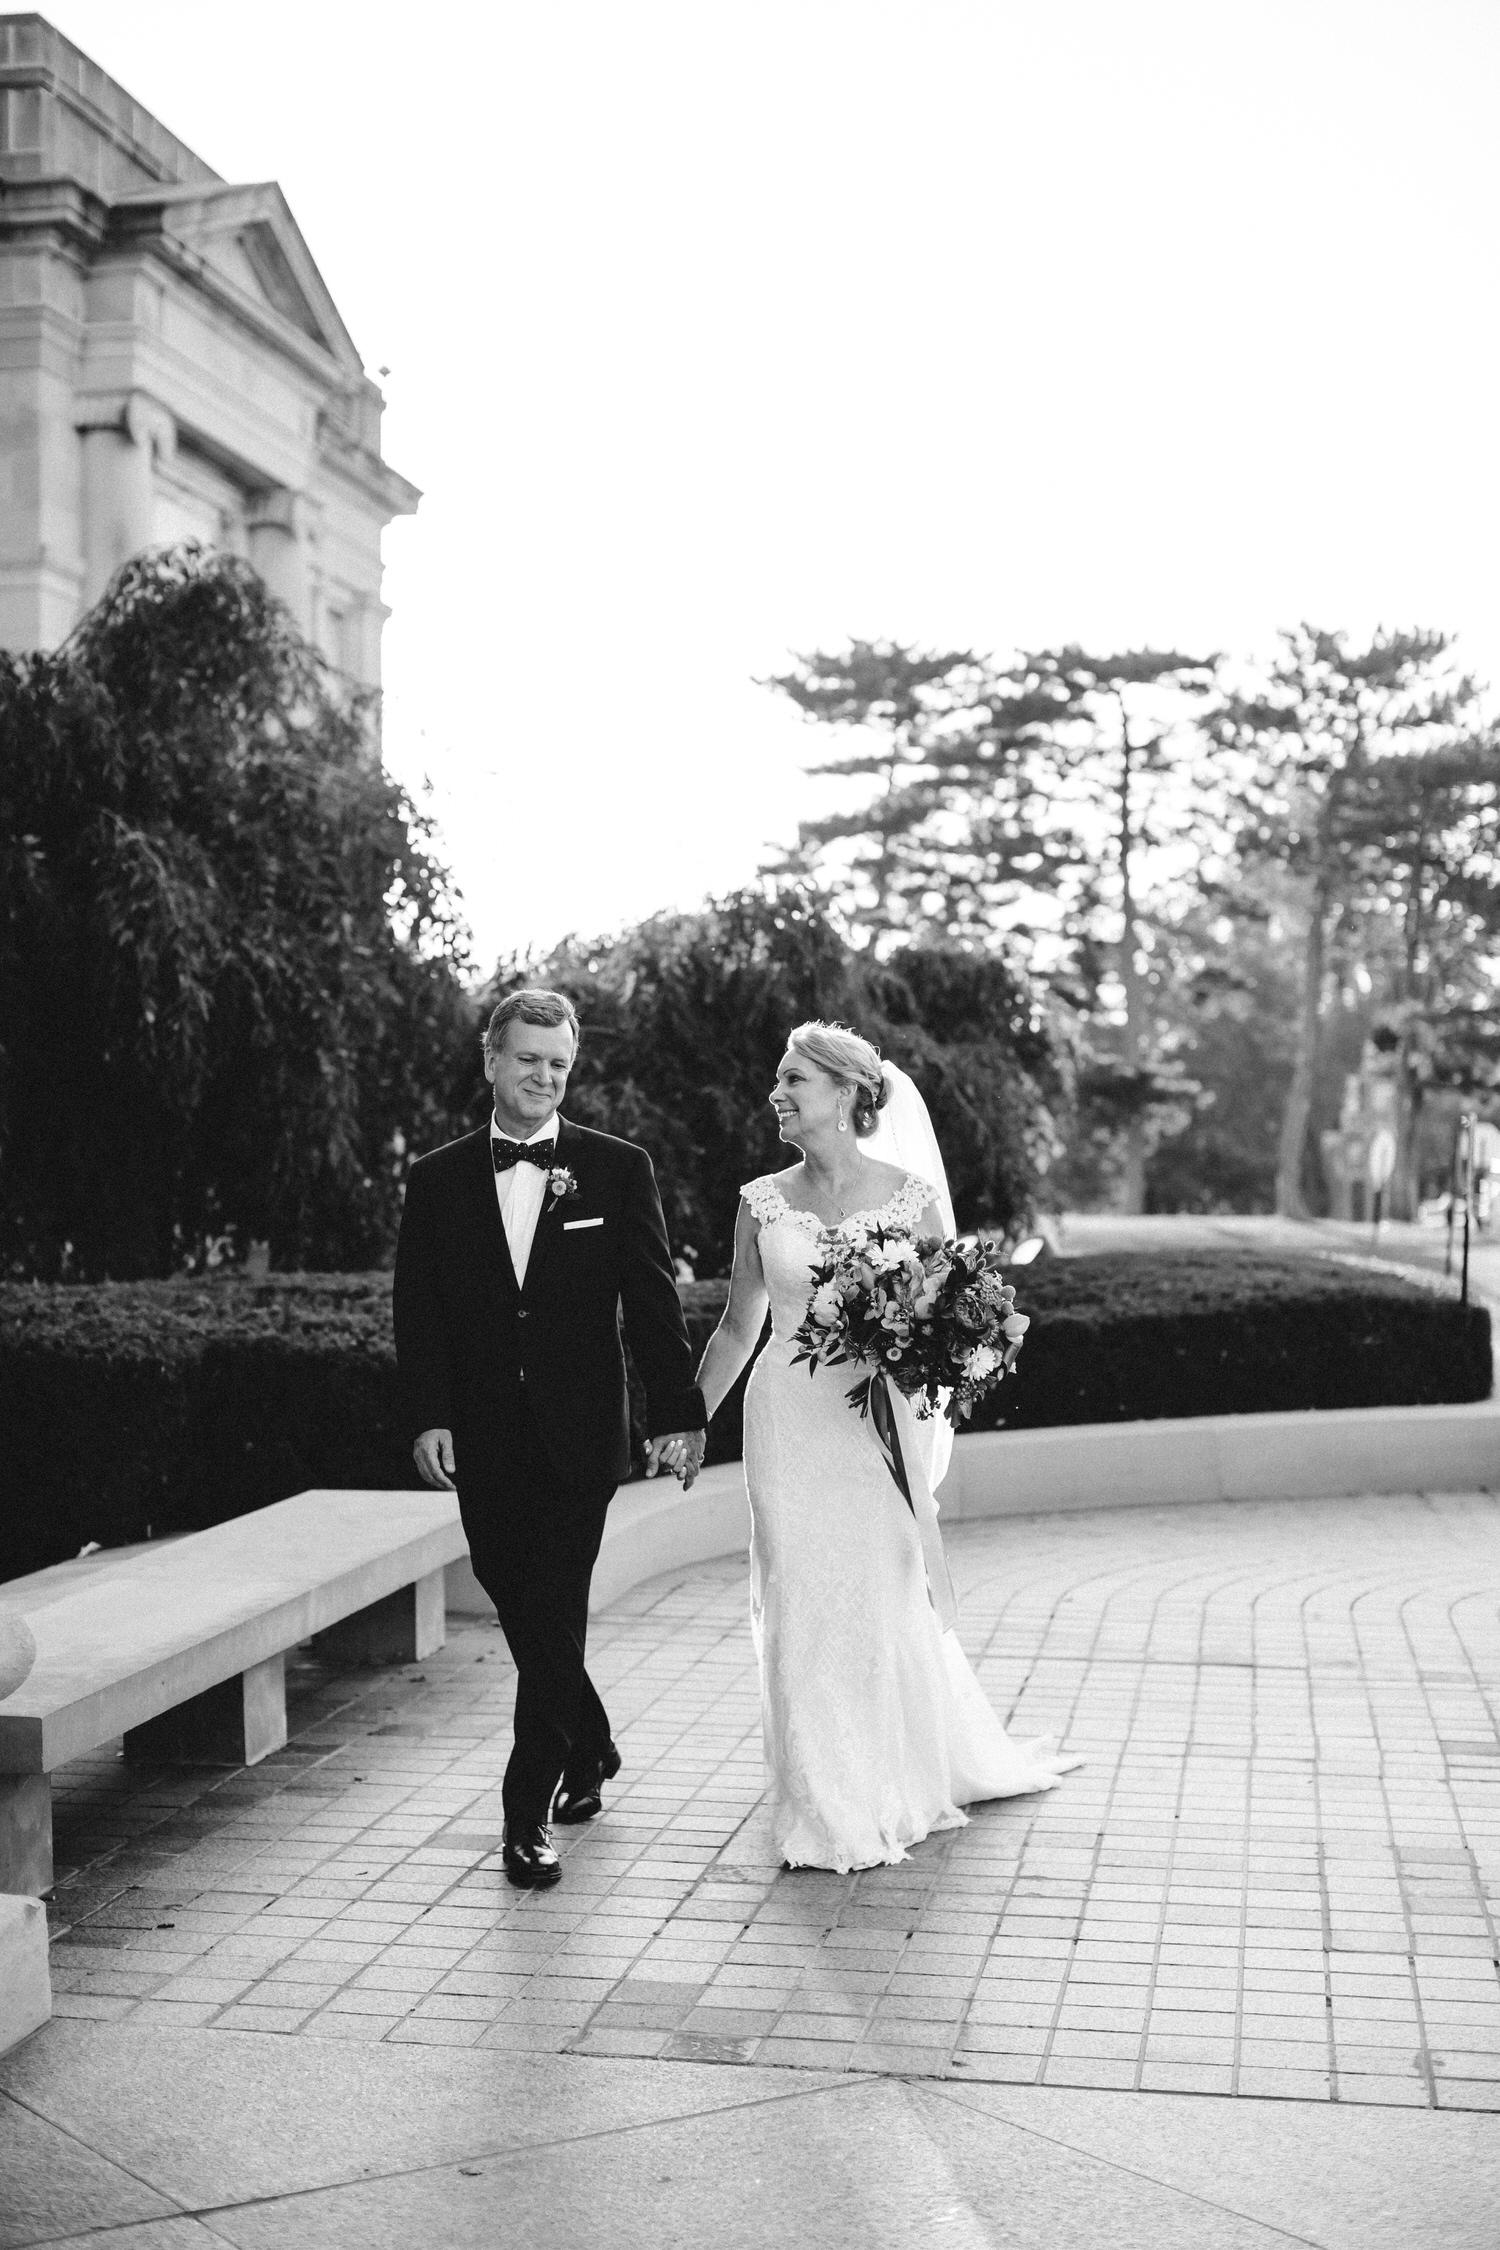 Second wedding, St Louis Art Museum Wedding